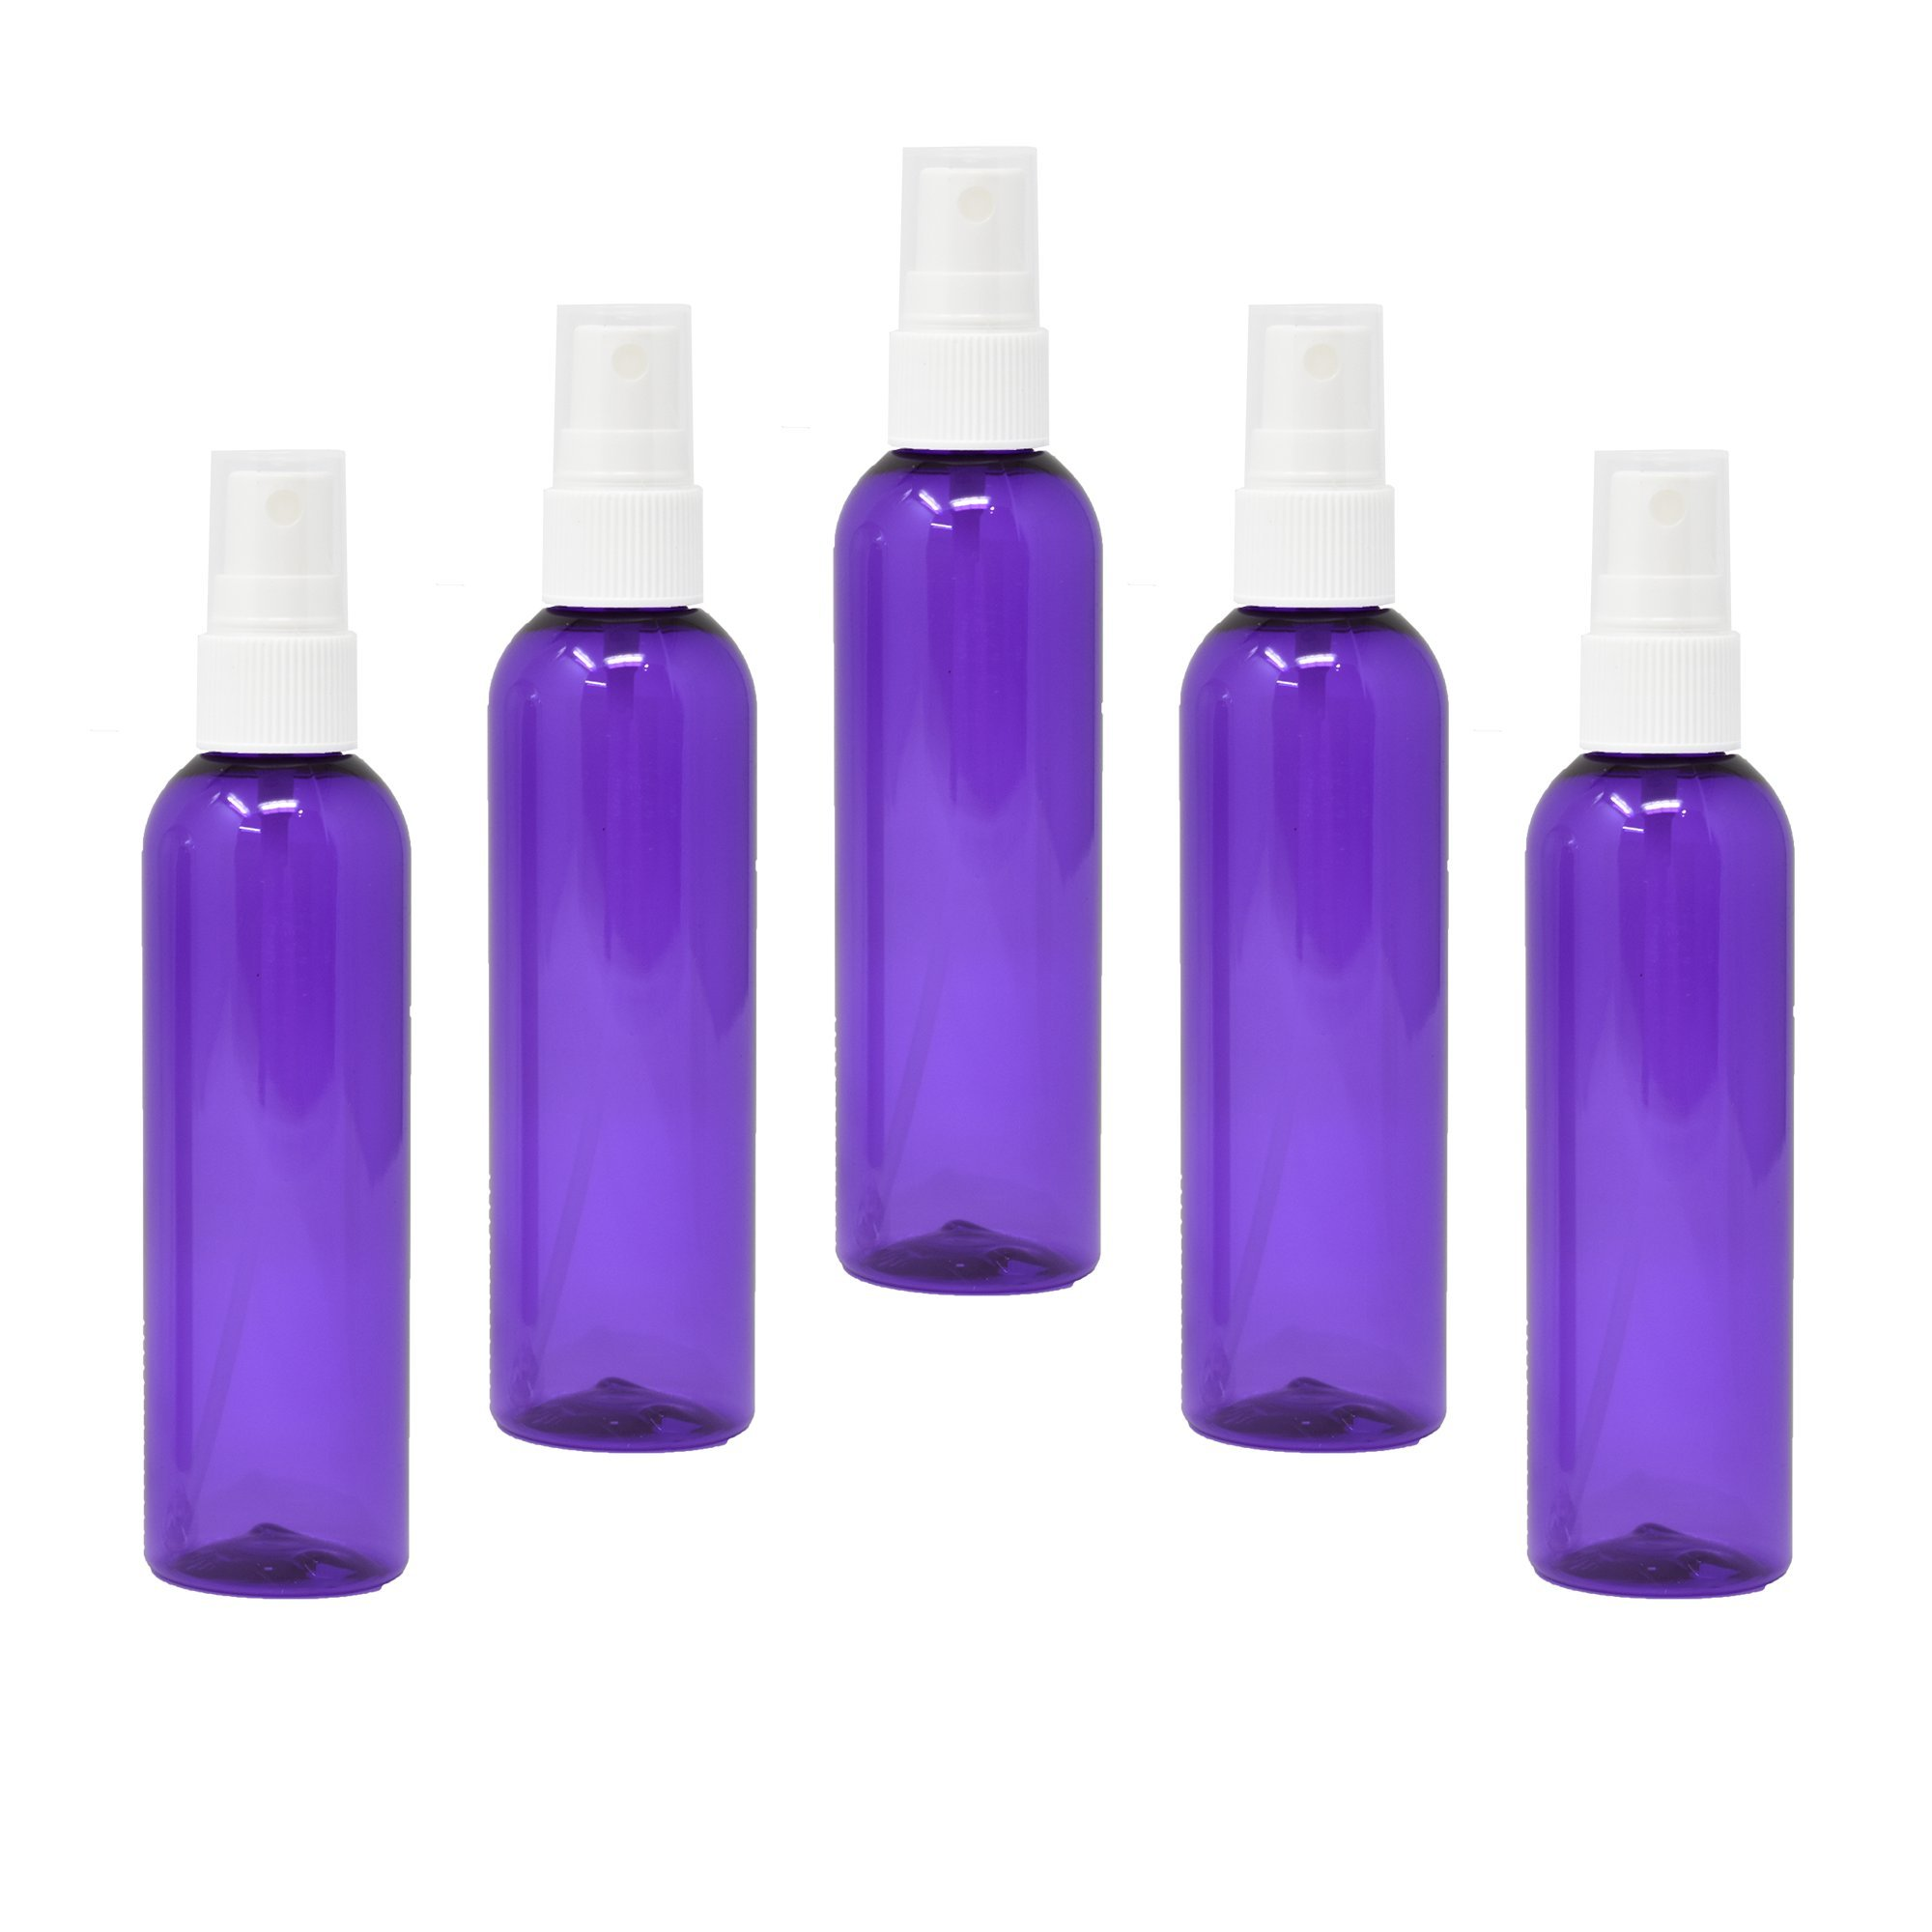 Plastic Spray Bottles 4oz with Fine Mist Sprayer (5 Pack, Purple)